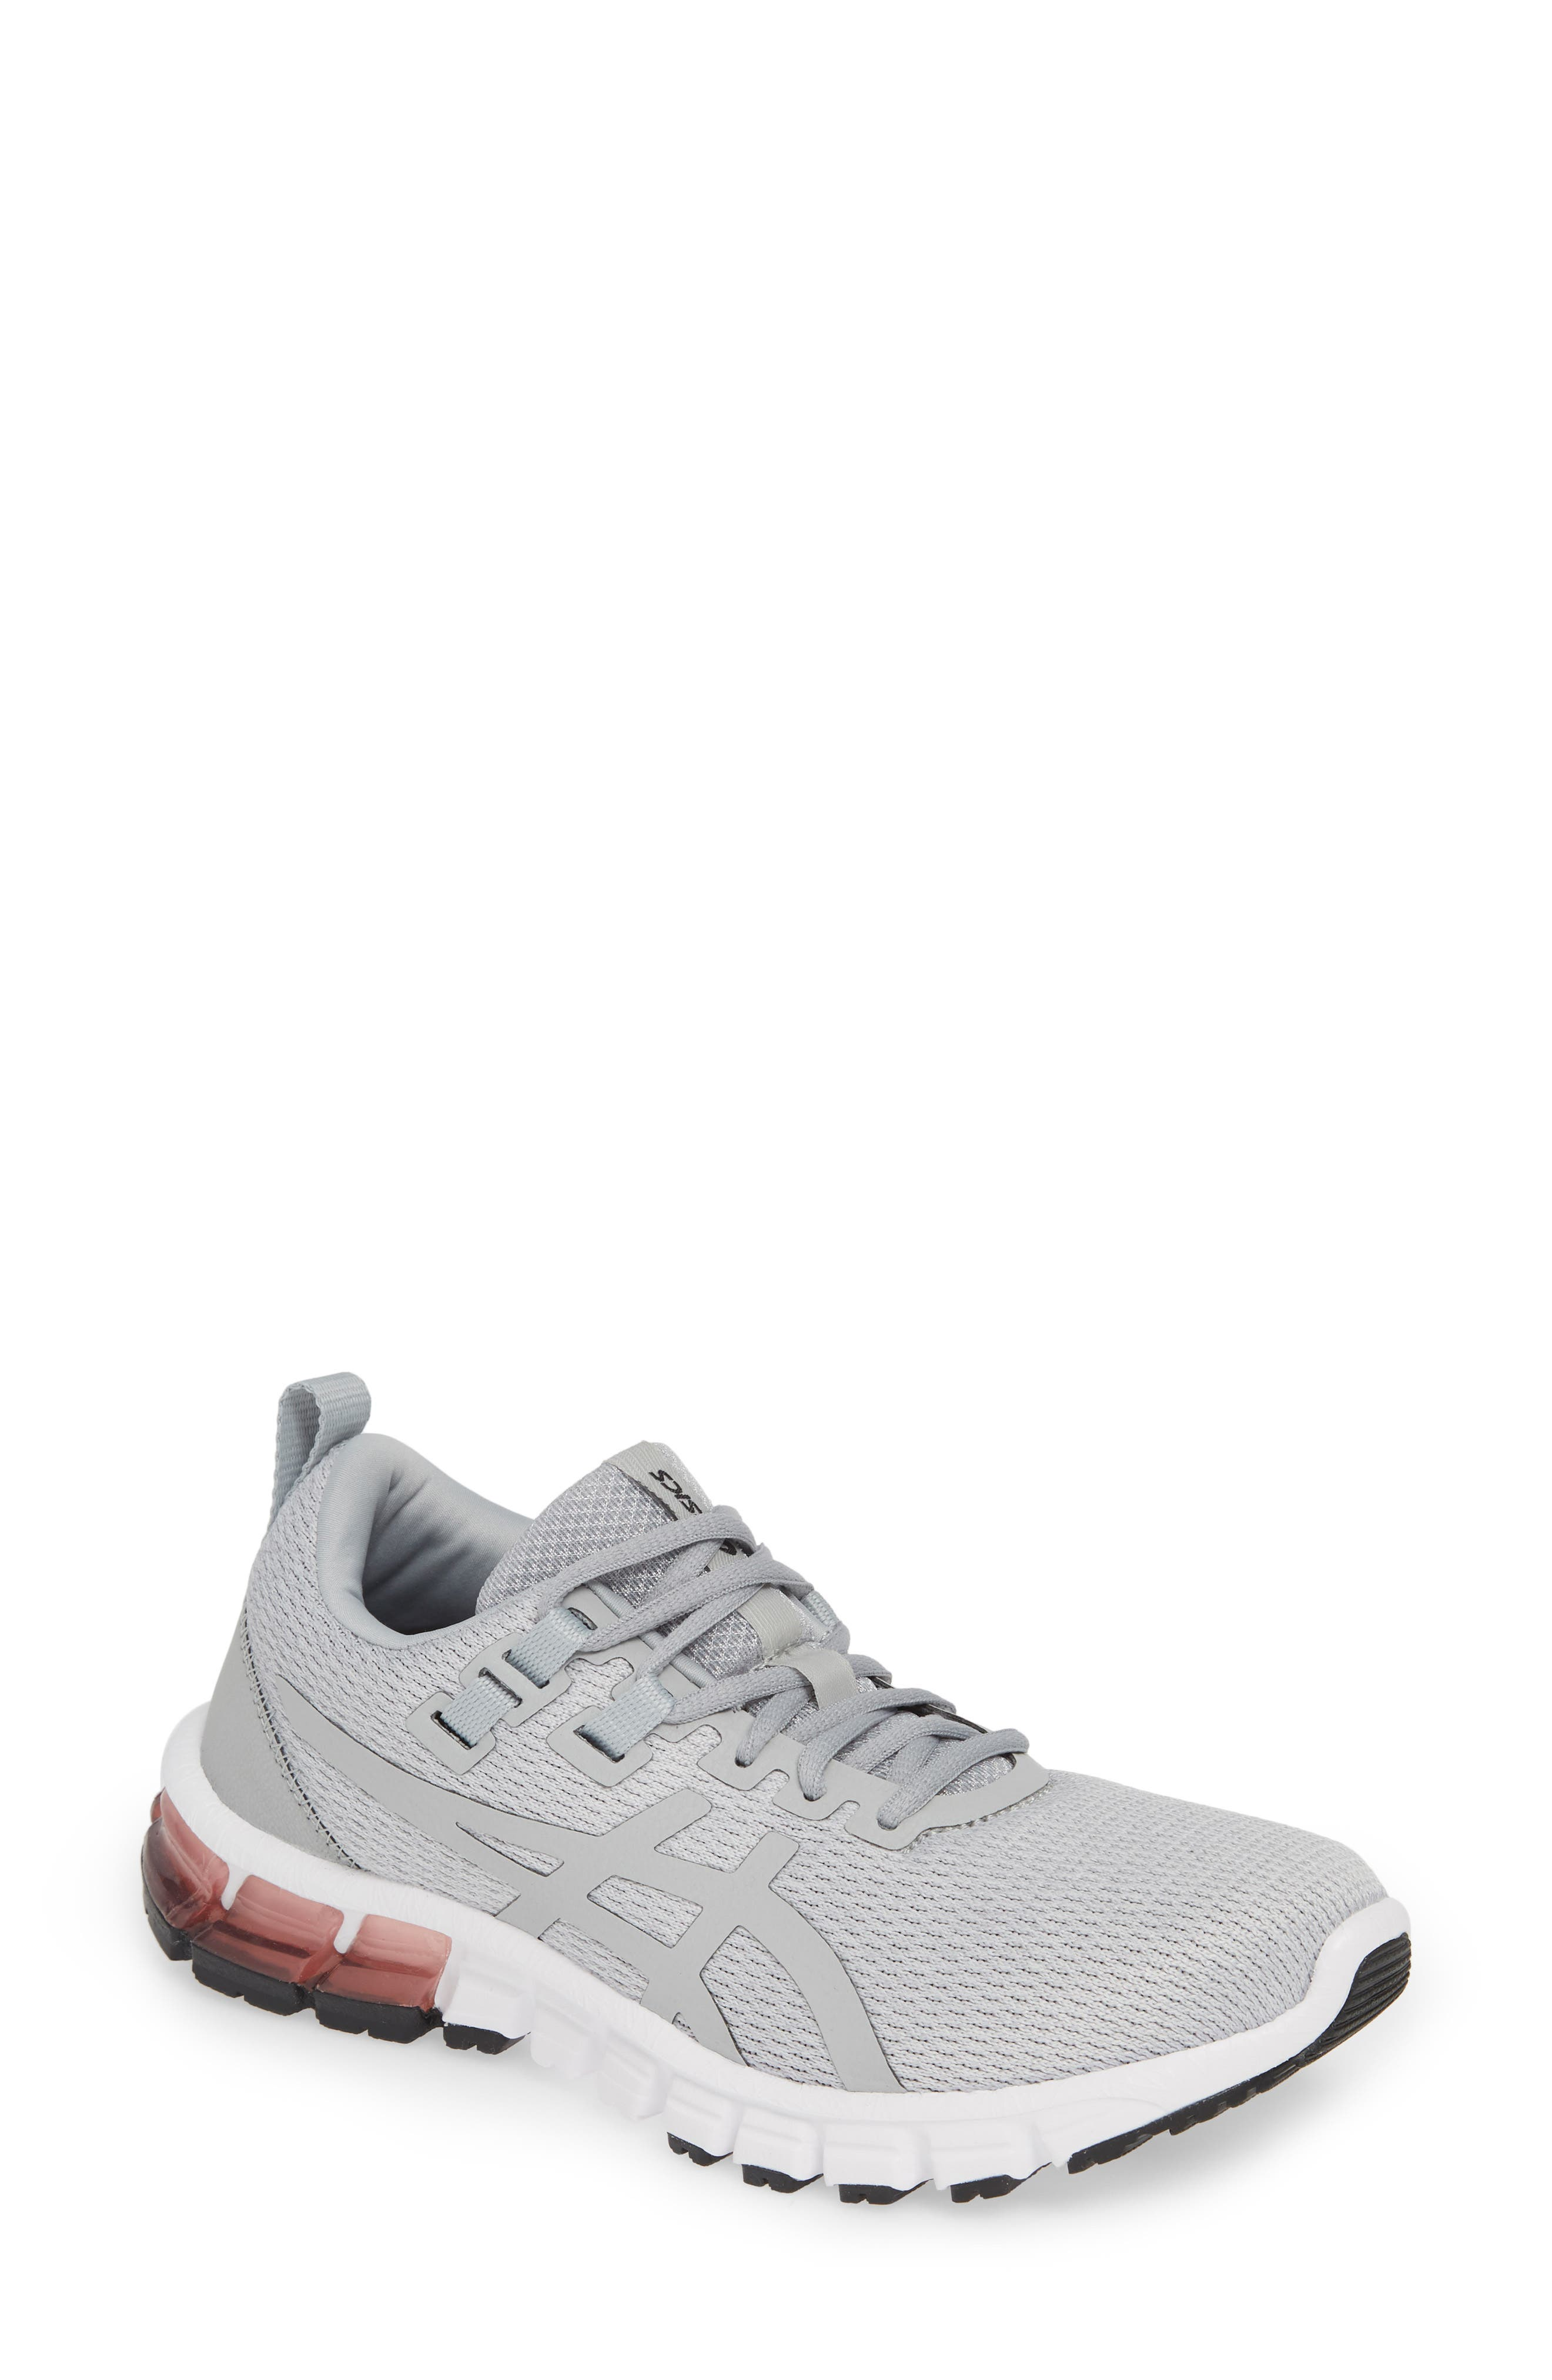 Asics Gel Quantum 90 Running Shoe B - Grey